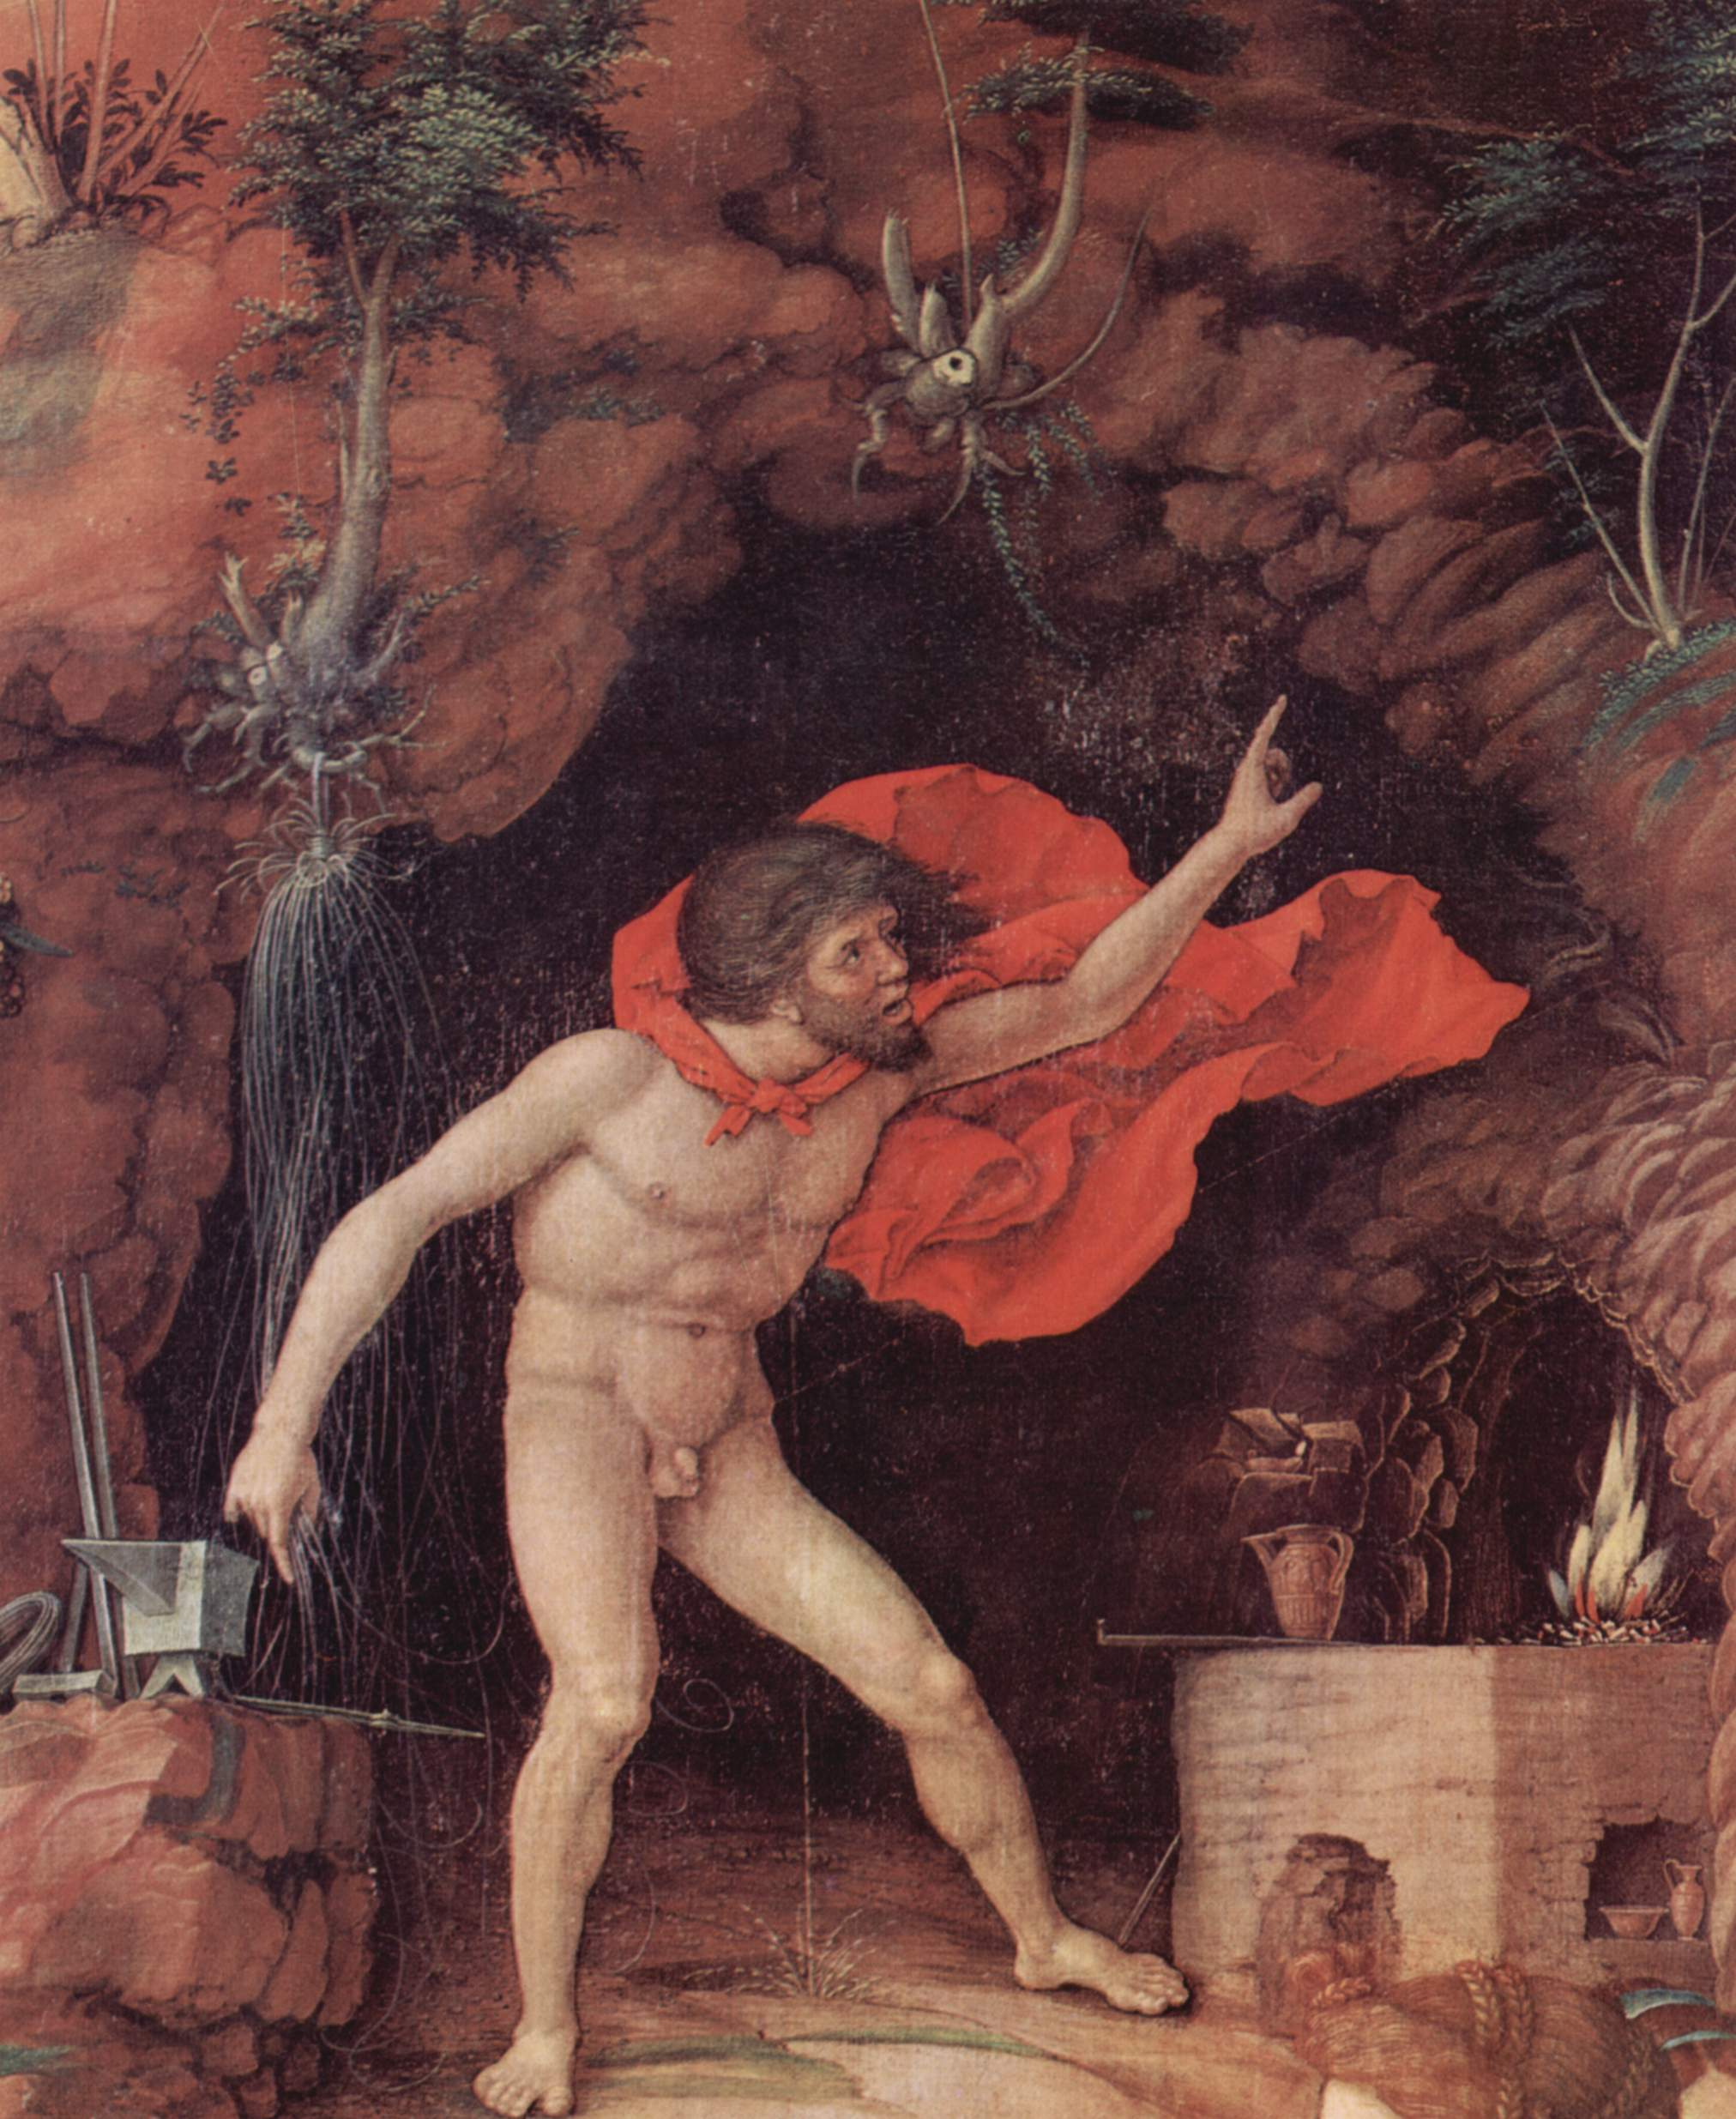 hephaestus vulcan god of blacksmiths fire and volcanoes thinglink